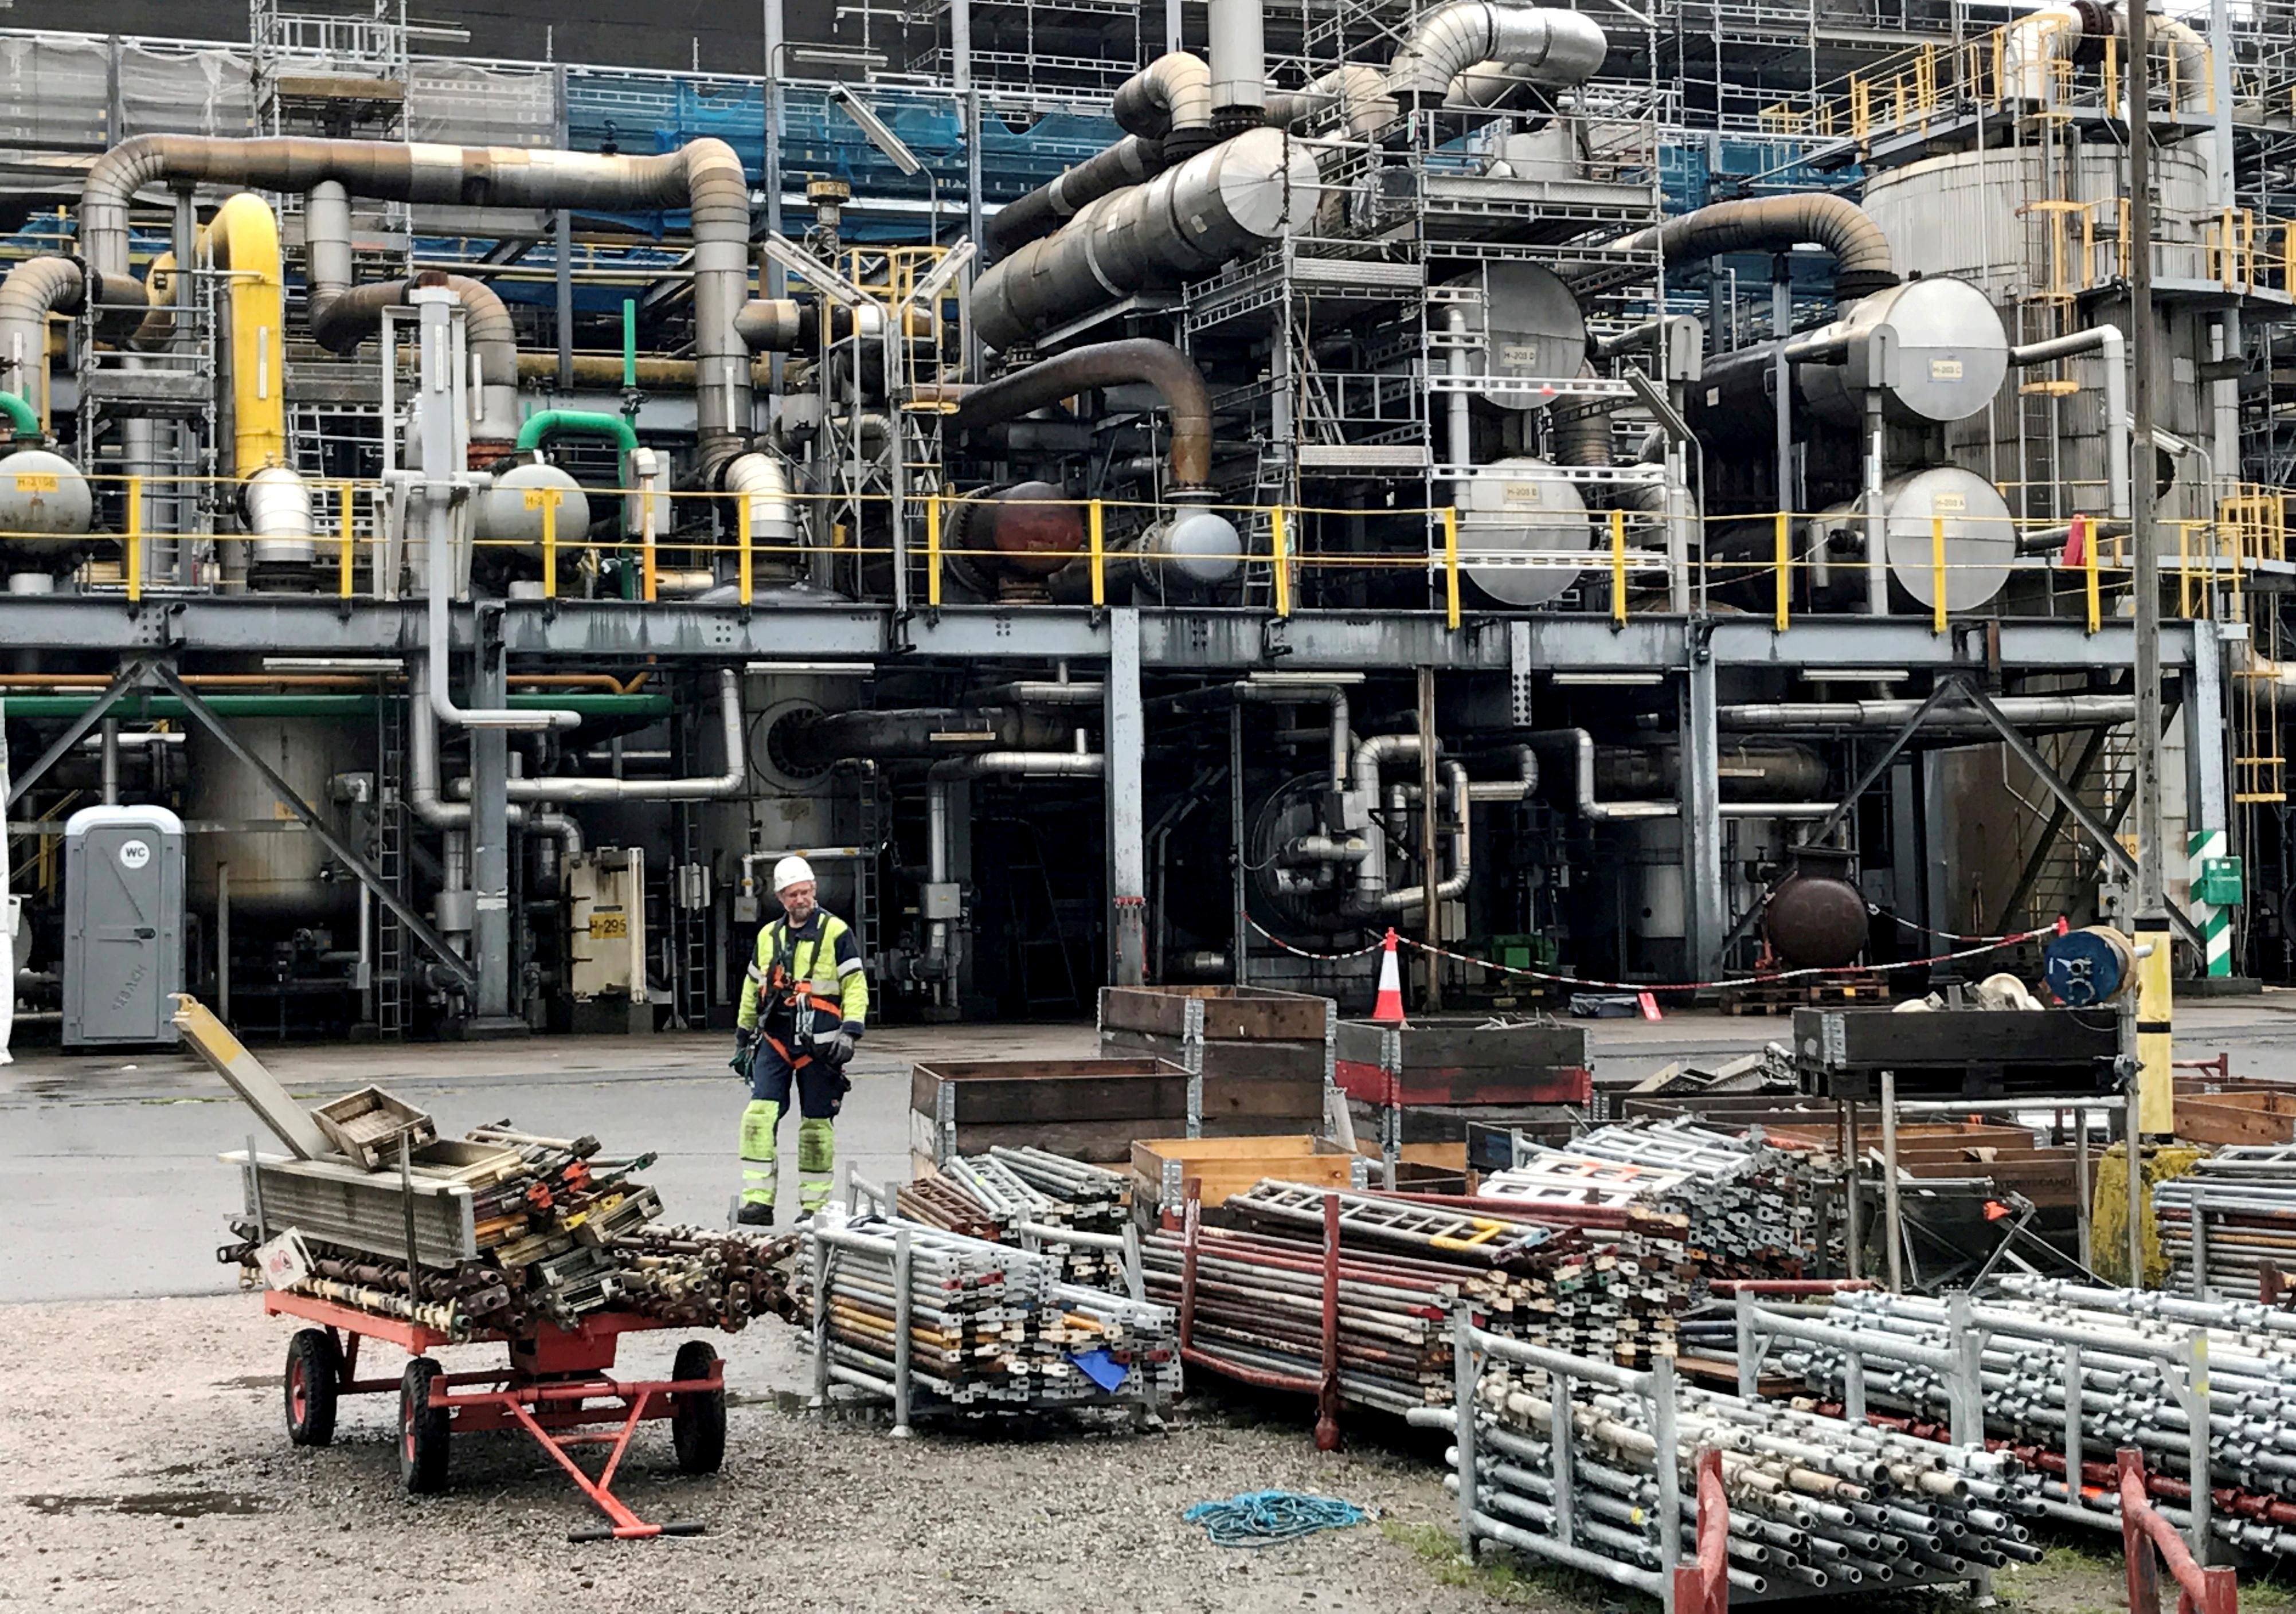 A worker walks at the Yara ammonia plant in Porsgrunn, Norway August 9, 2017. REUTERS/Lefteris Karagiannopoulos